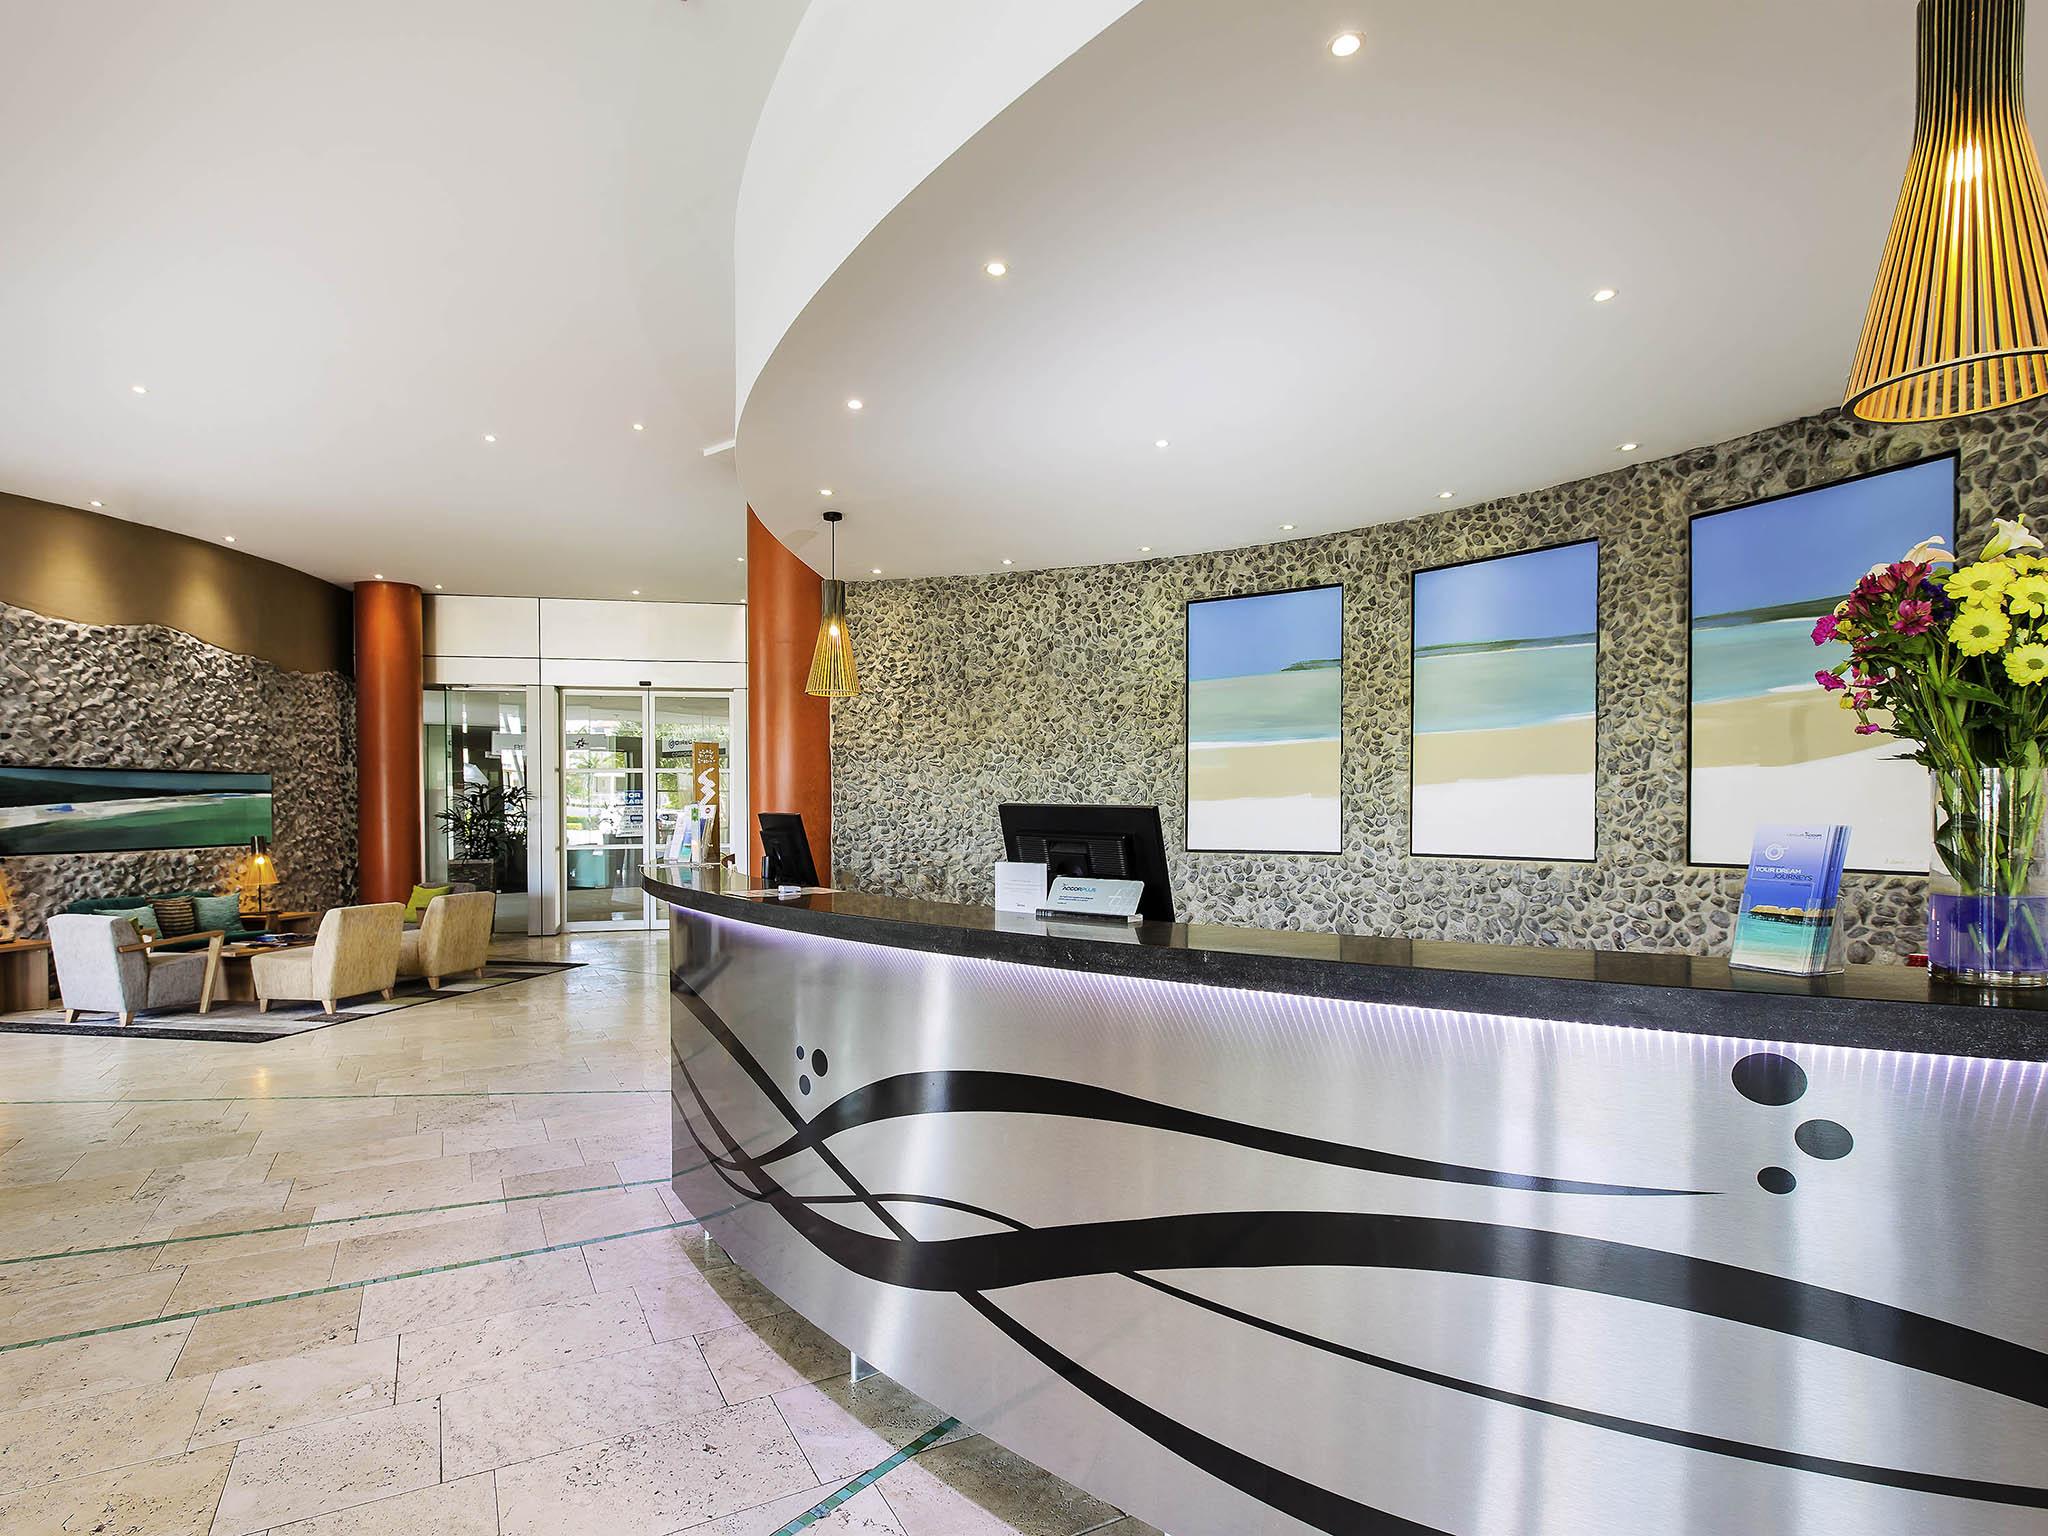 Hotel – The Sebel Marrochydore